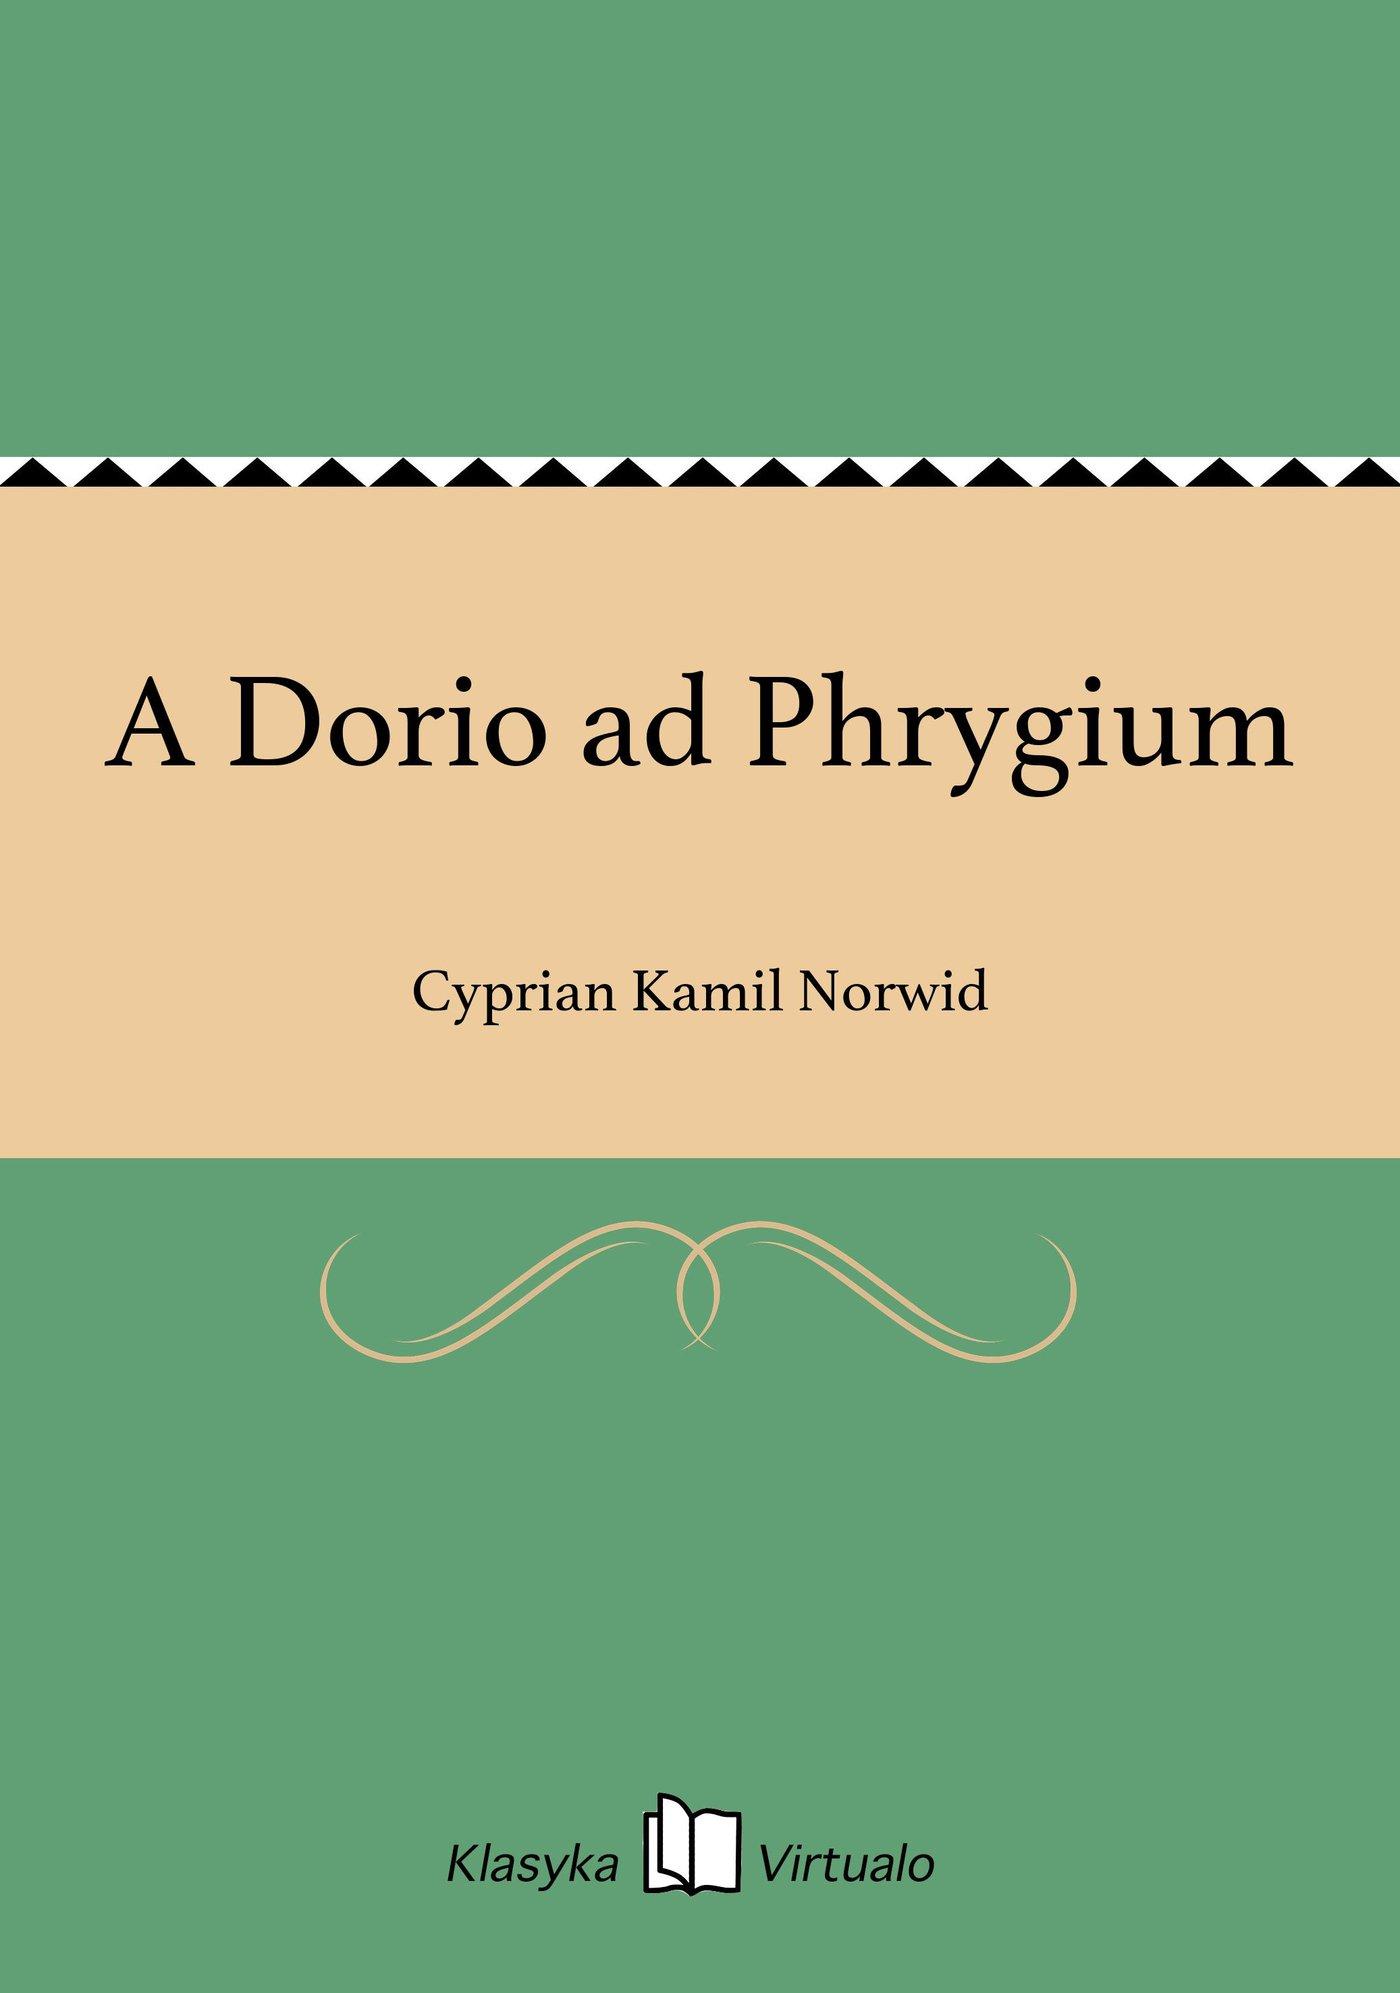 A Dorio ad Phrygium - Ebook (Książka na Kindle) do pobrania w formacie MOBI